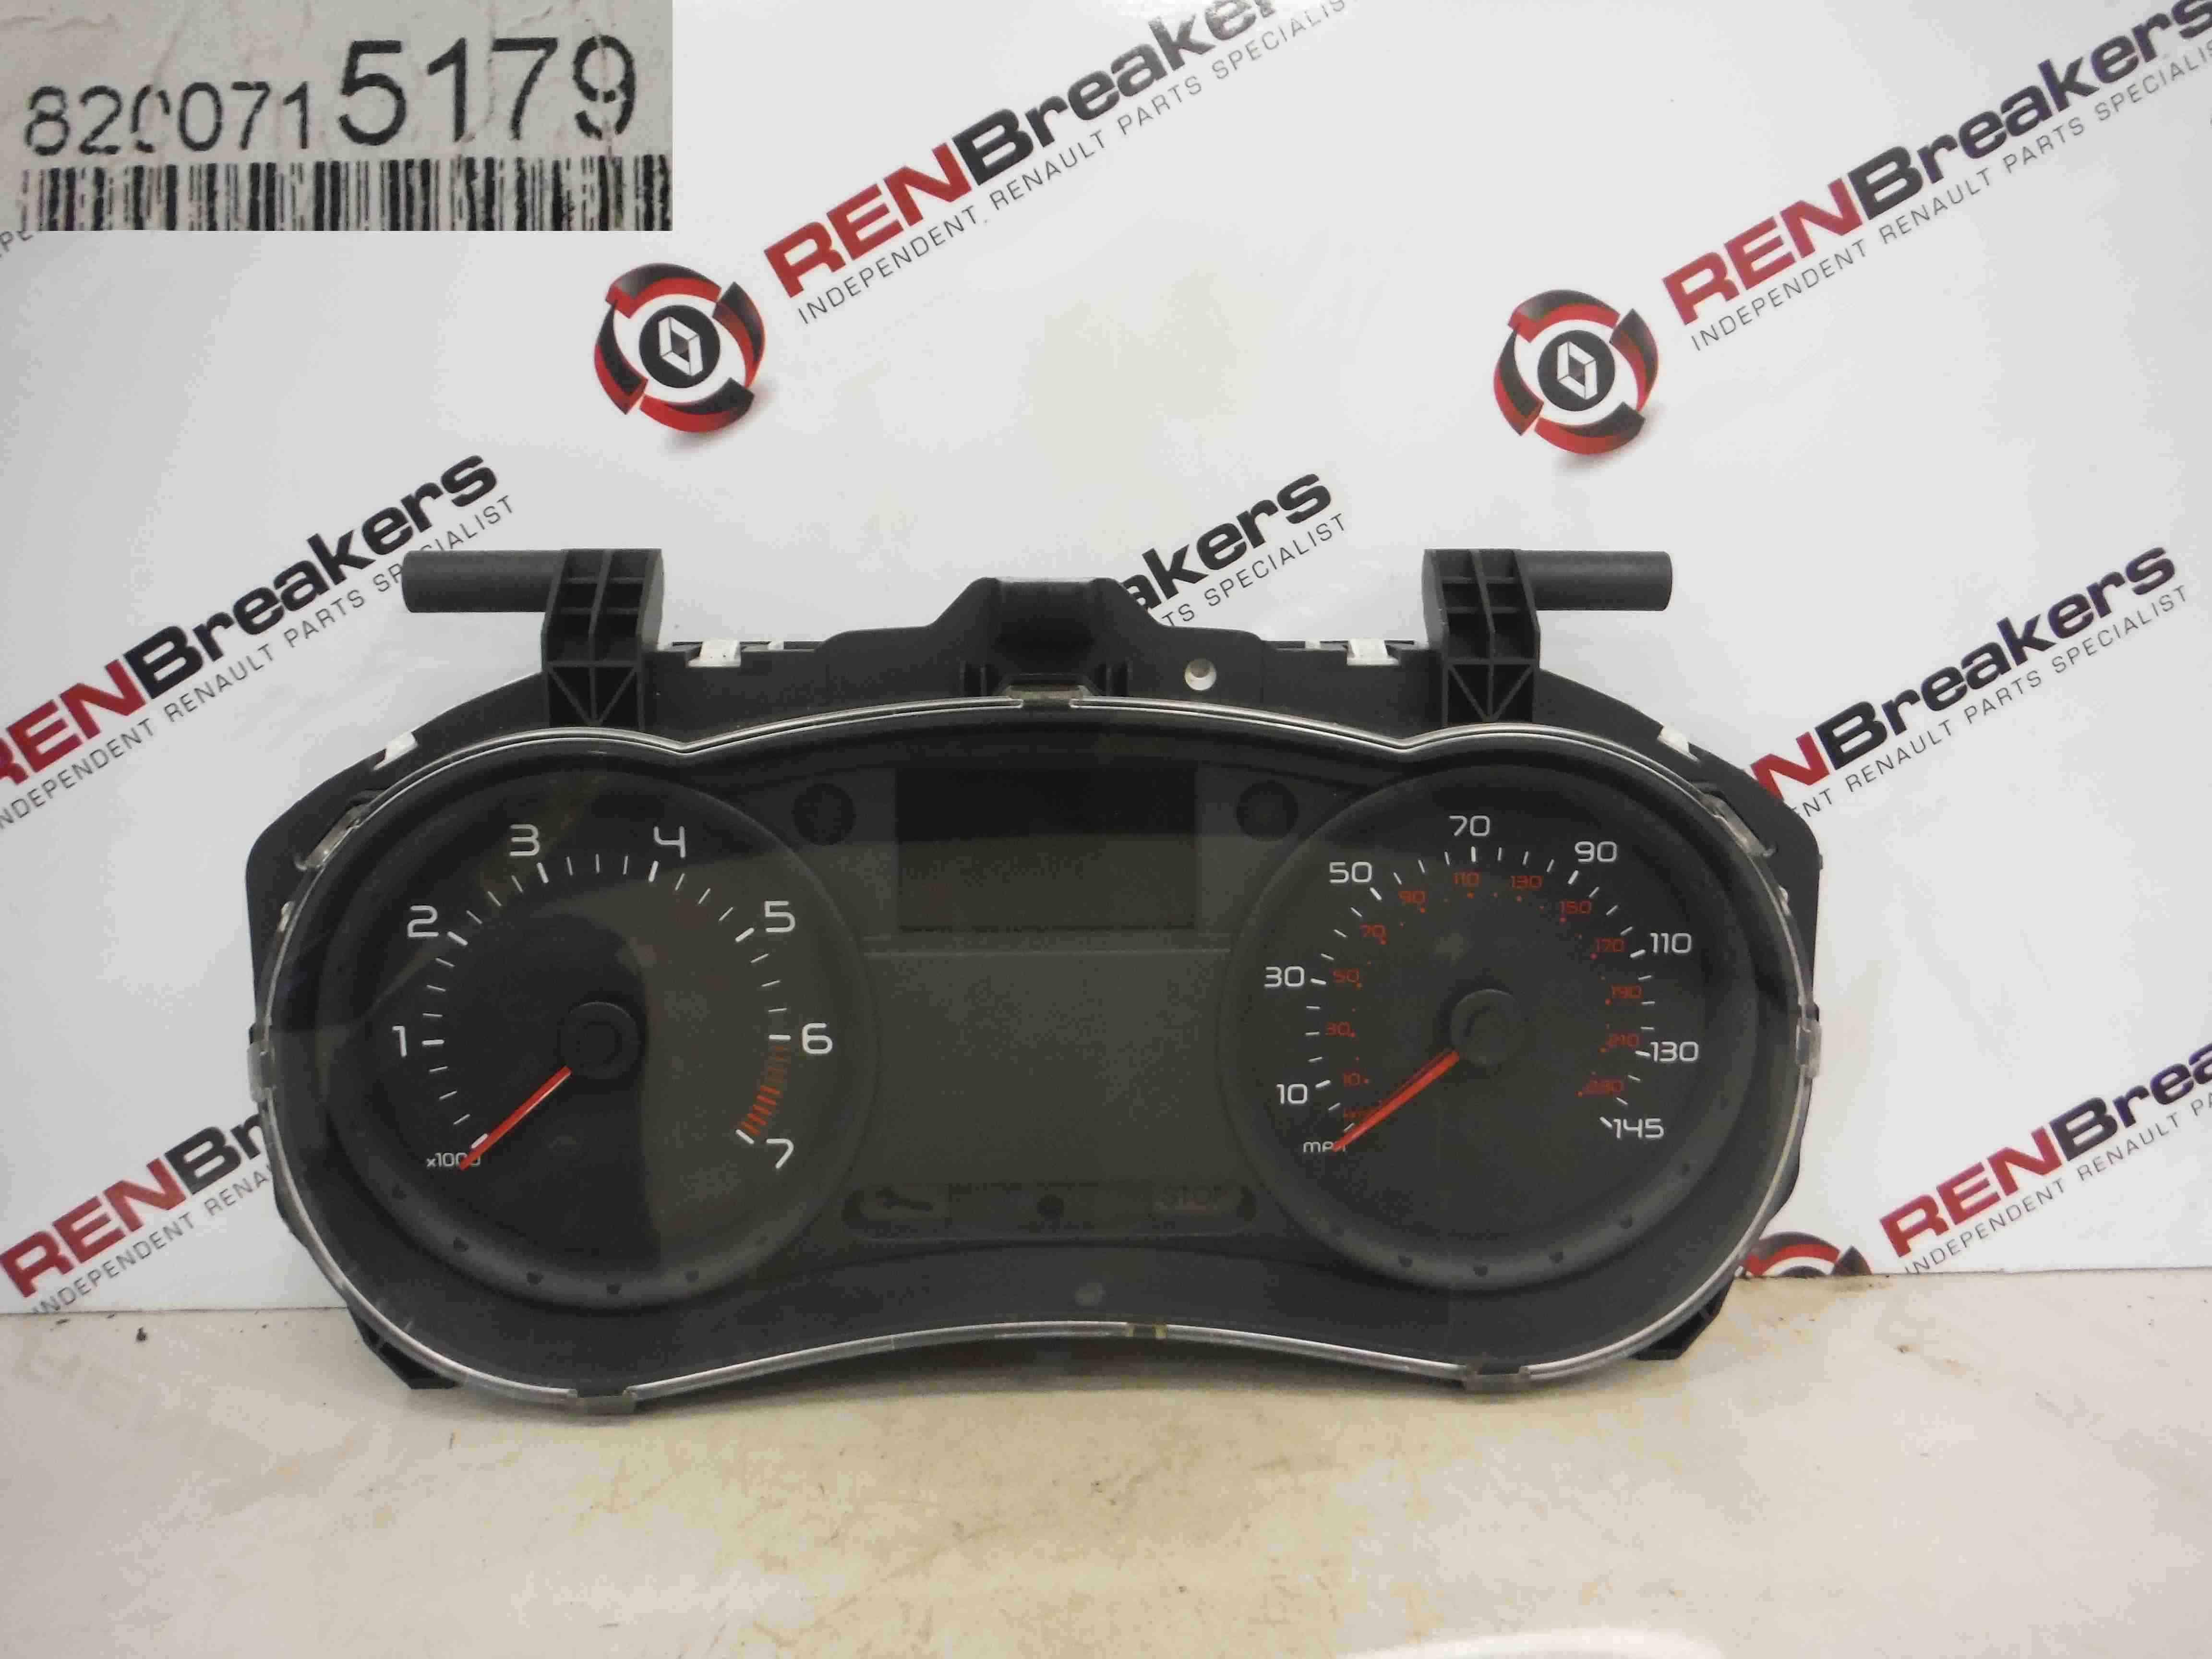 Renault Clio MK3 2005-2012 Instrument Panel Dials Clocks Gauges 64k 8200715179